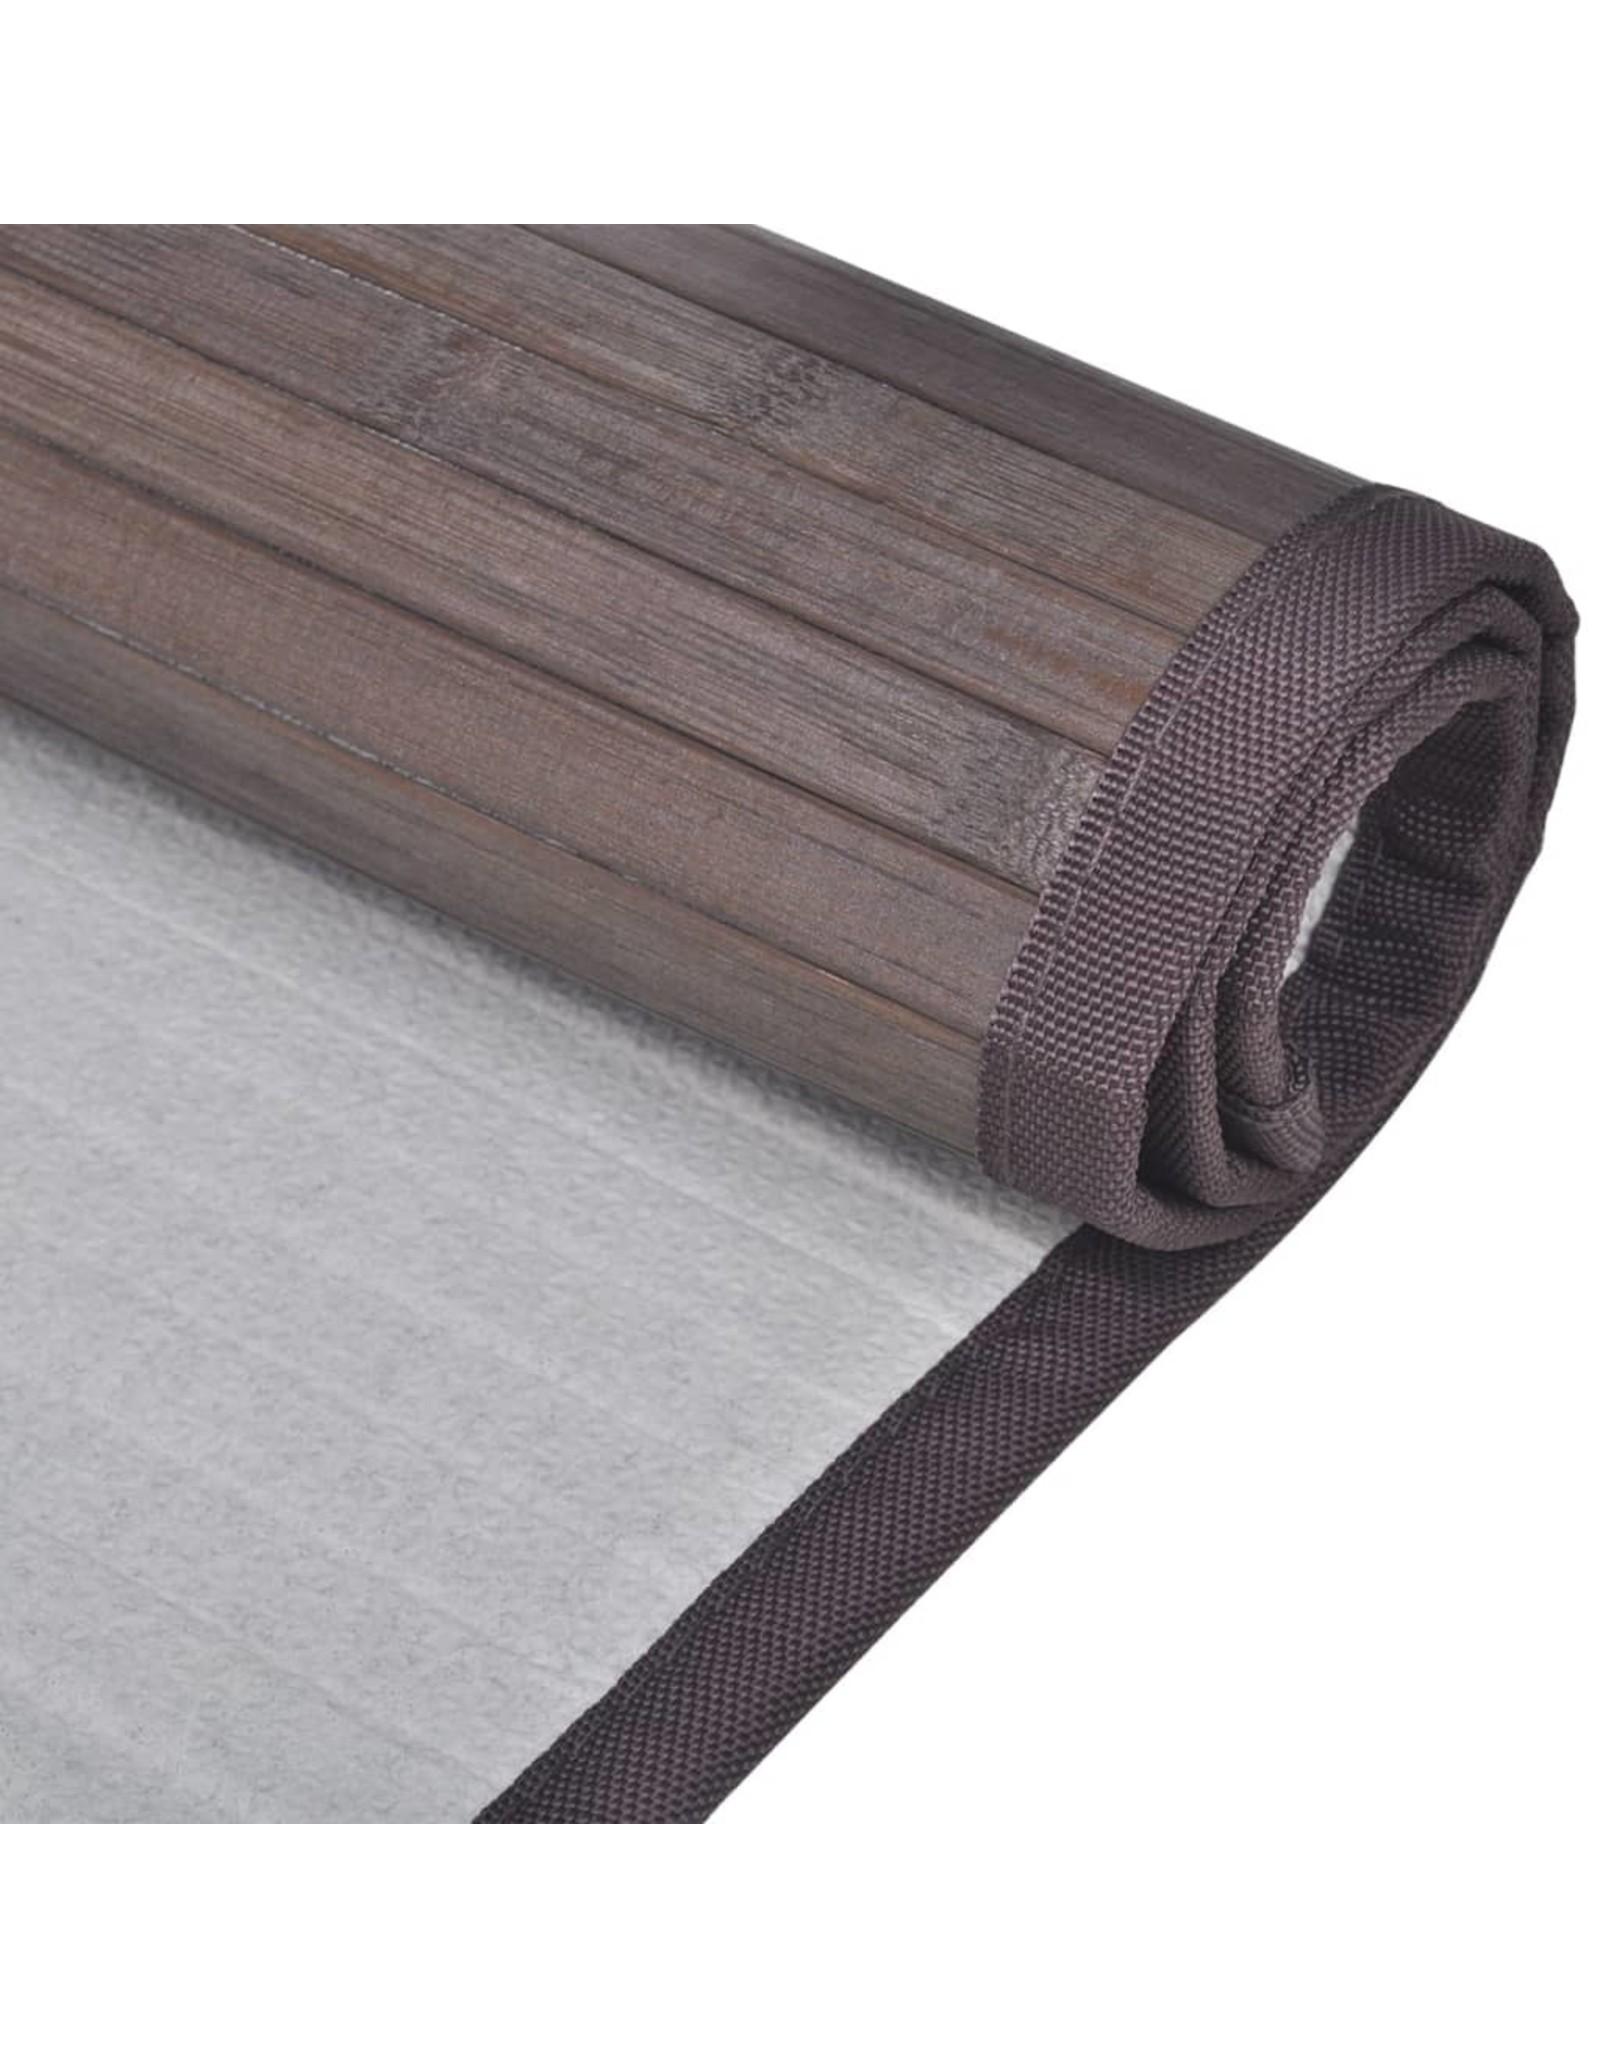 Badmatten 2 st 60x90 cm bamboe donkerbruin